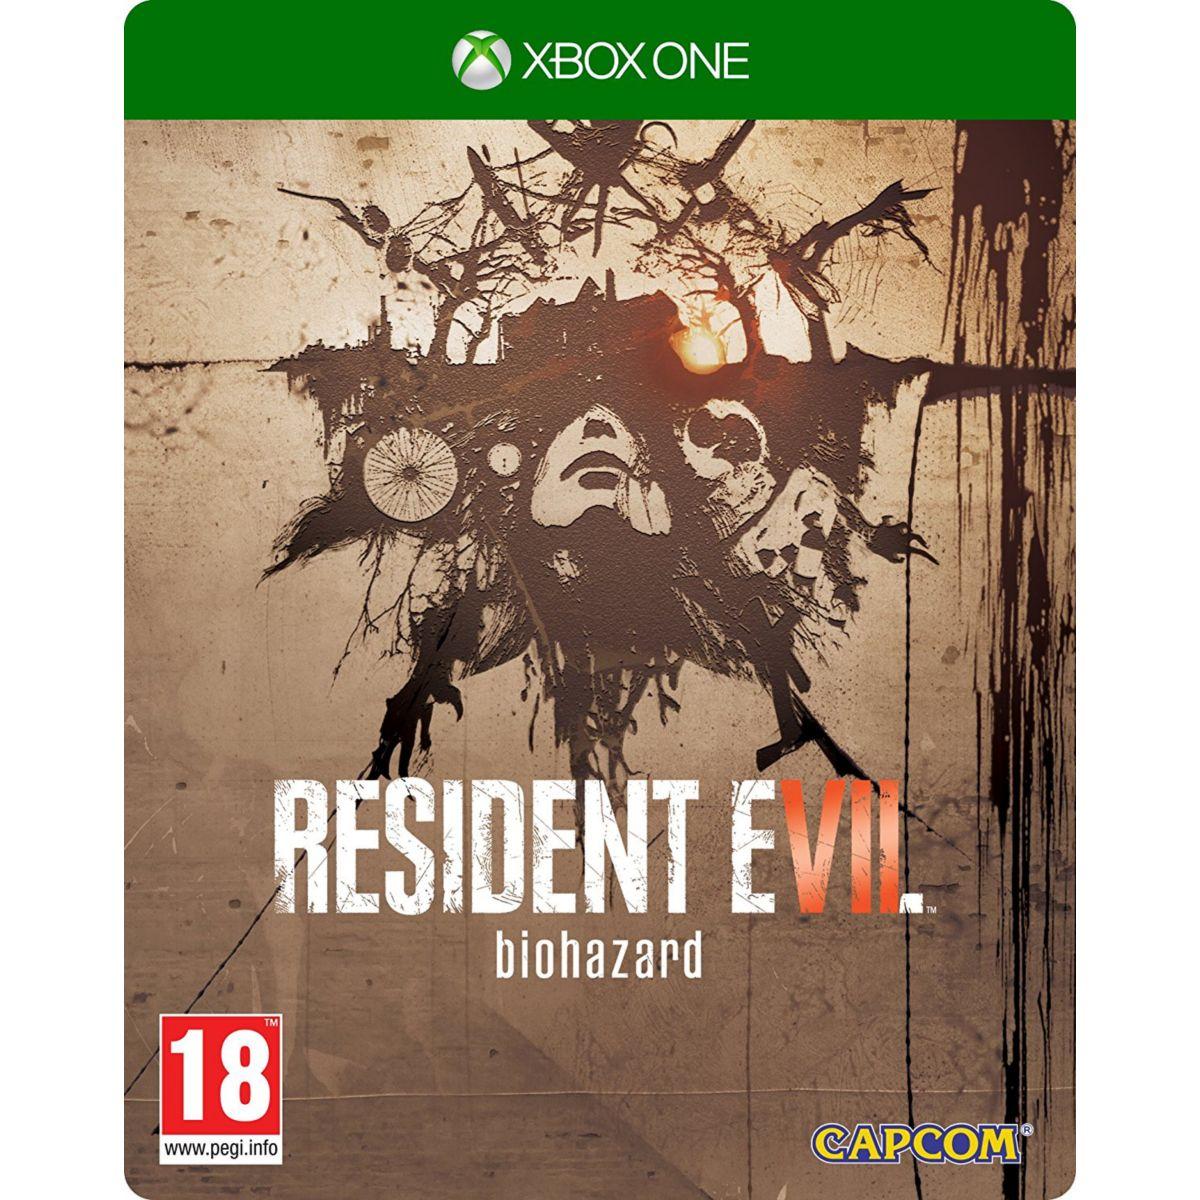 Jeu Xbox One CAPCOM Resident Evil 7 Biohazard Ed. Steelbook